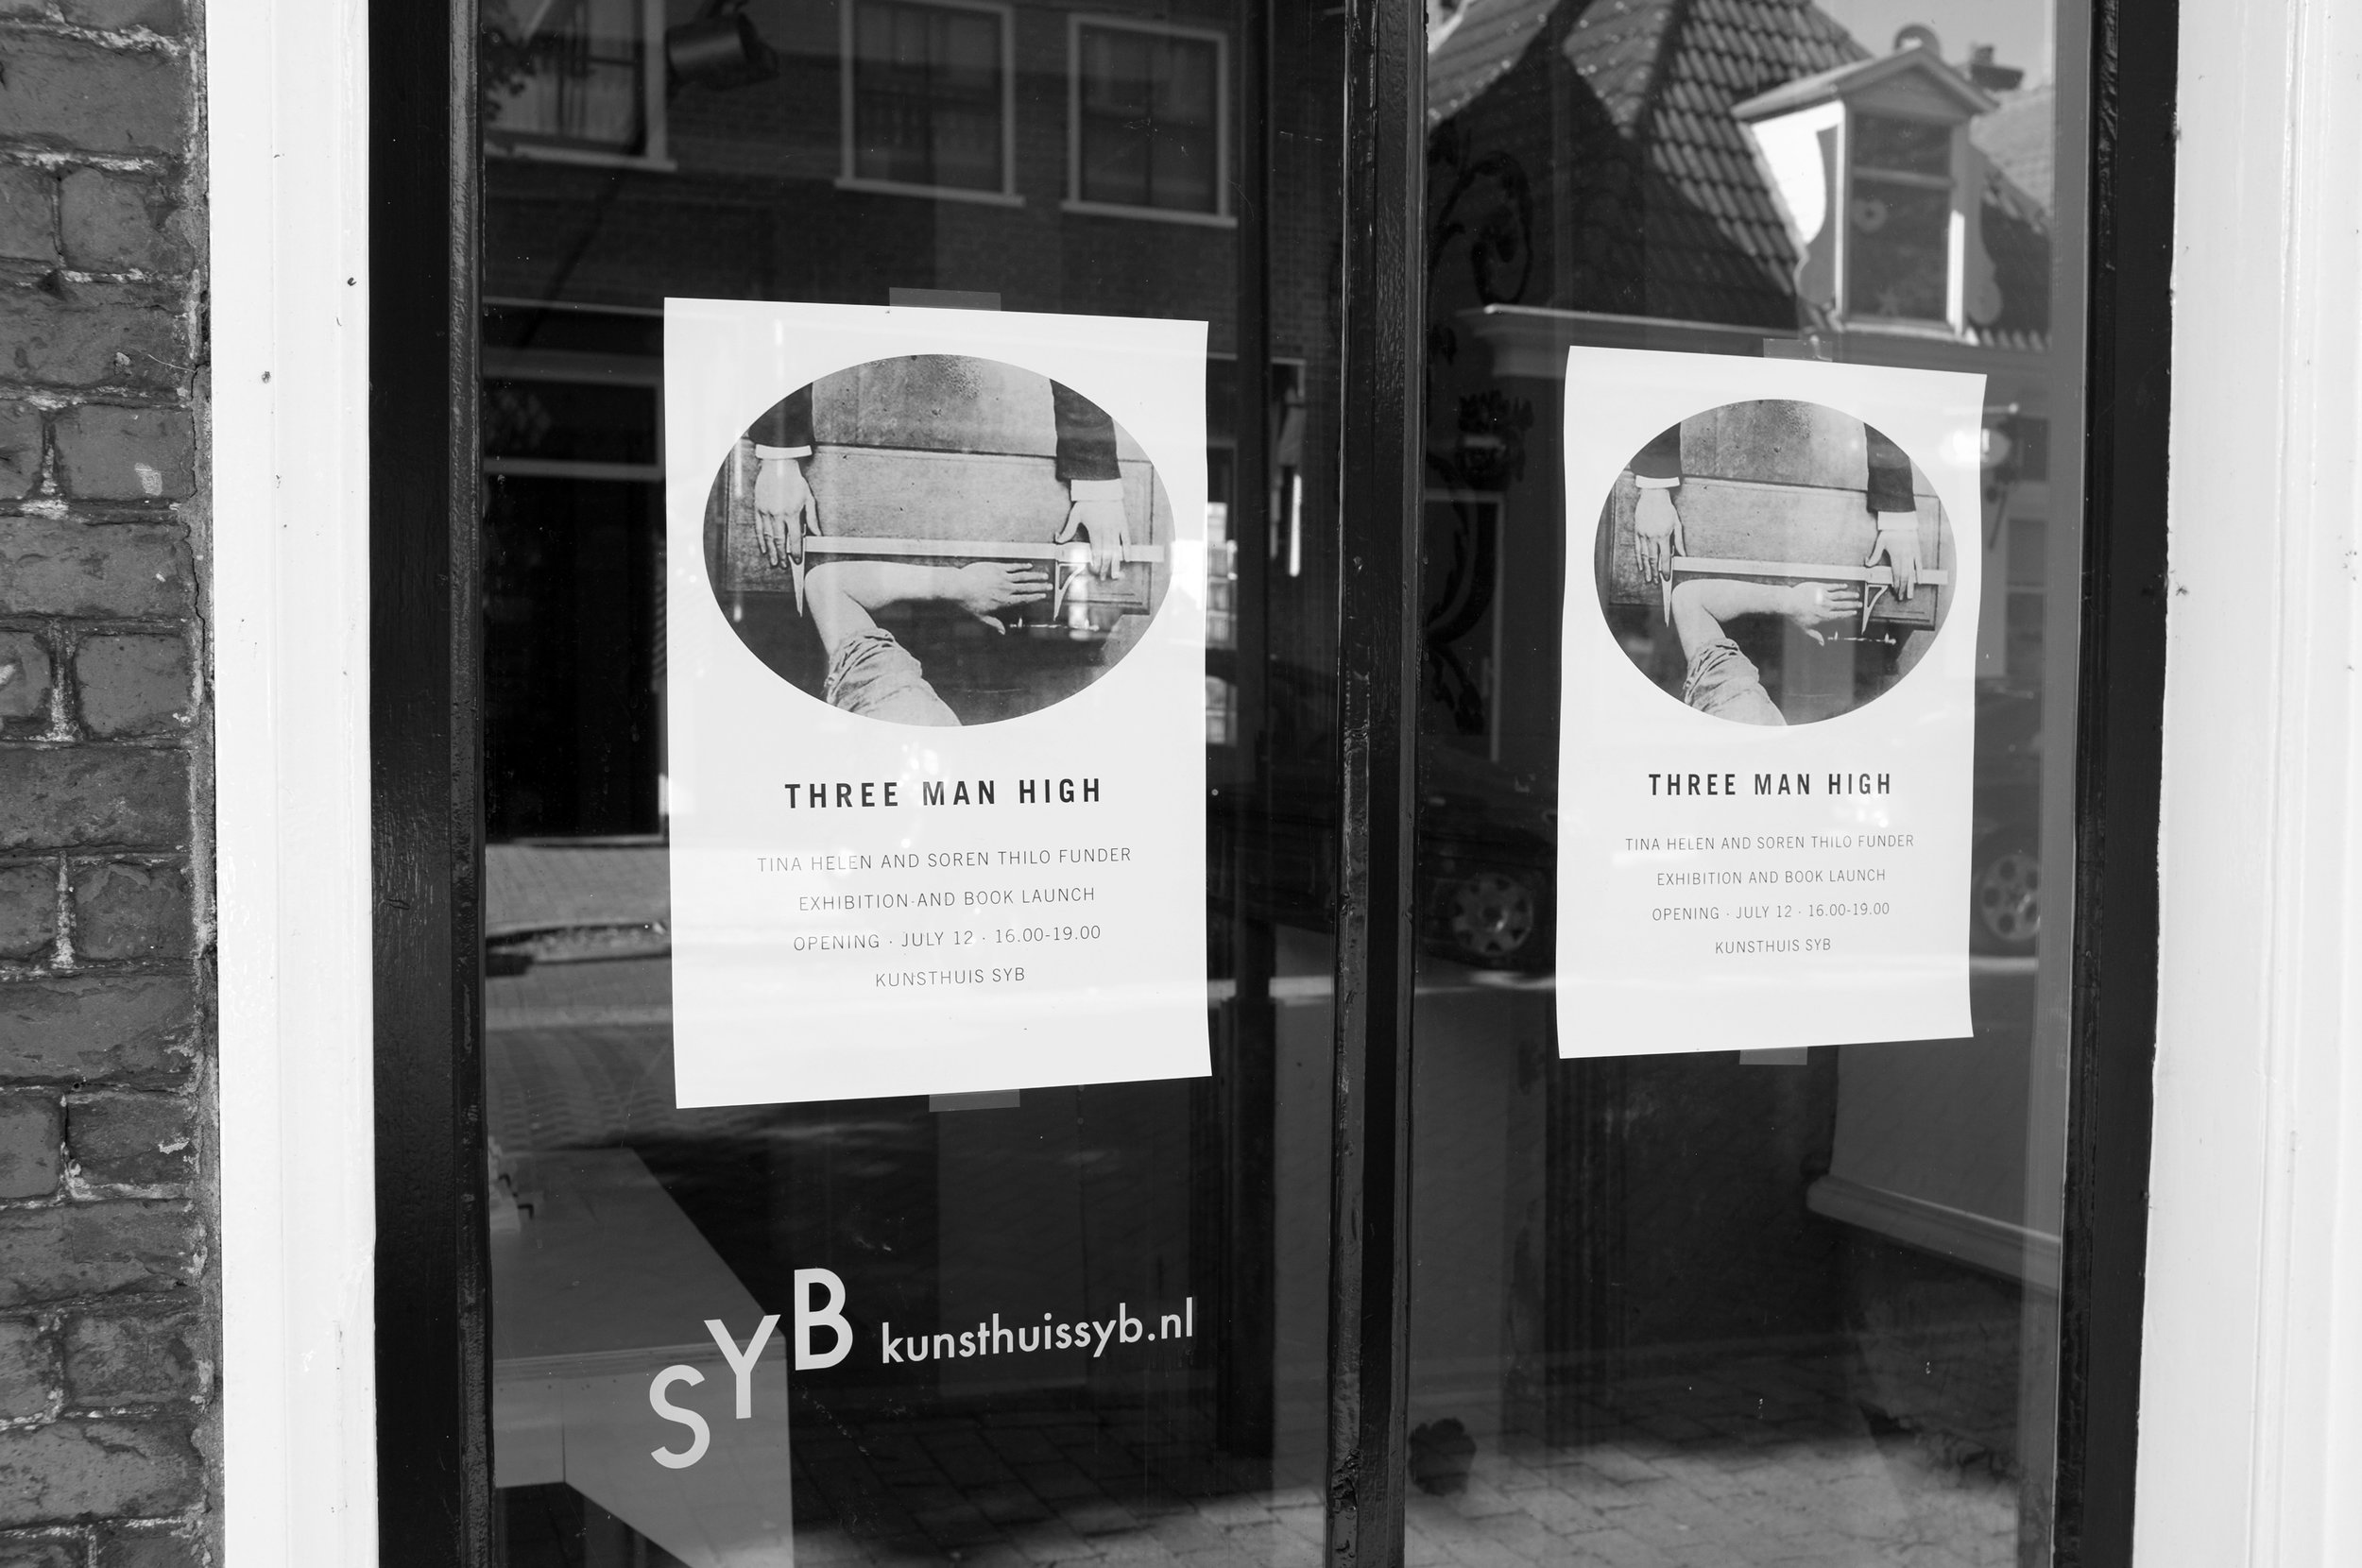 Three Man High. Poster, Kunsthuis SYB, 2014